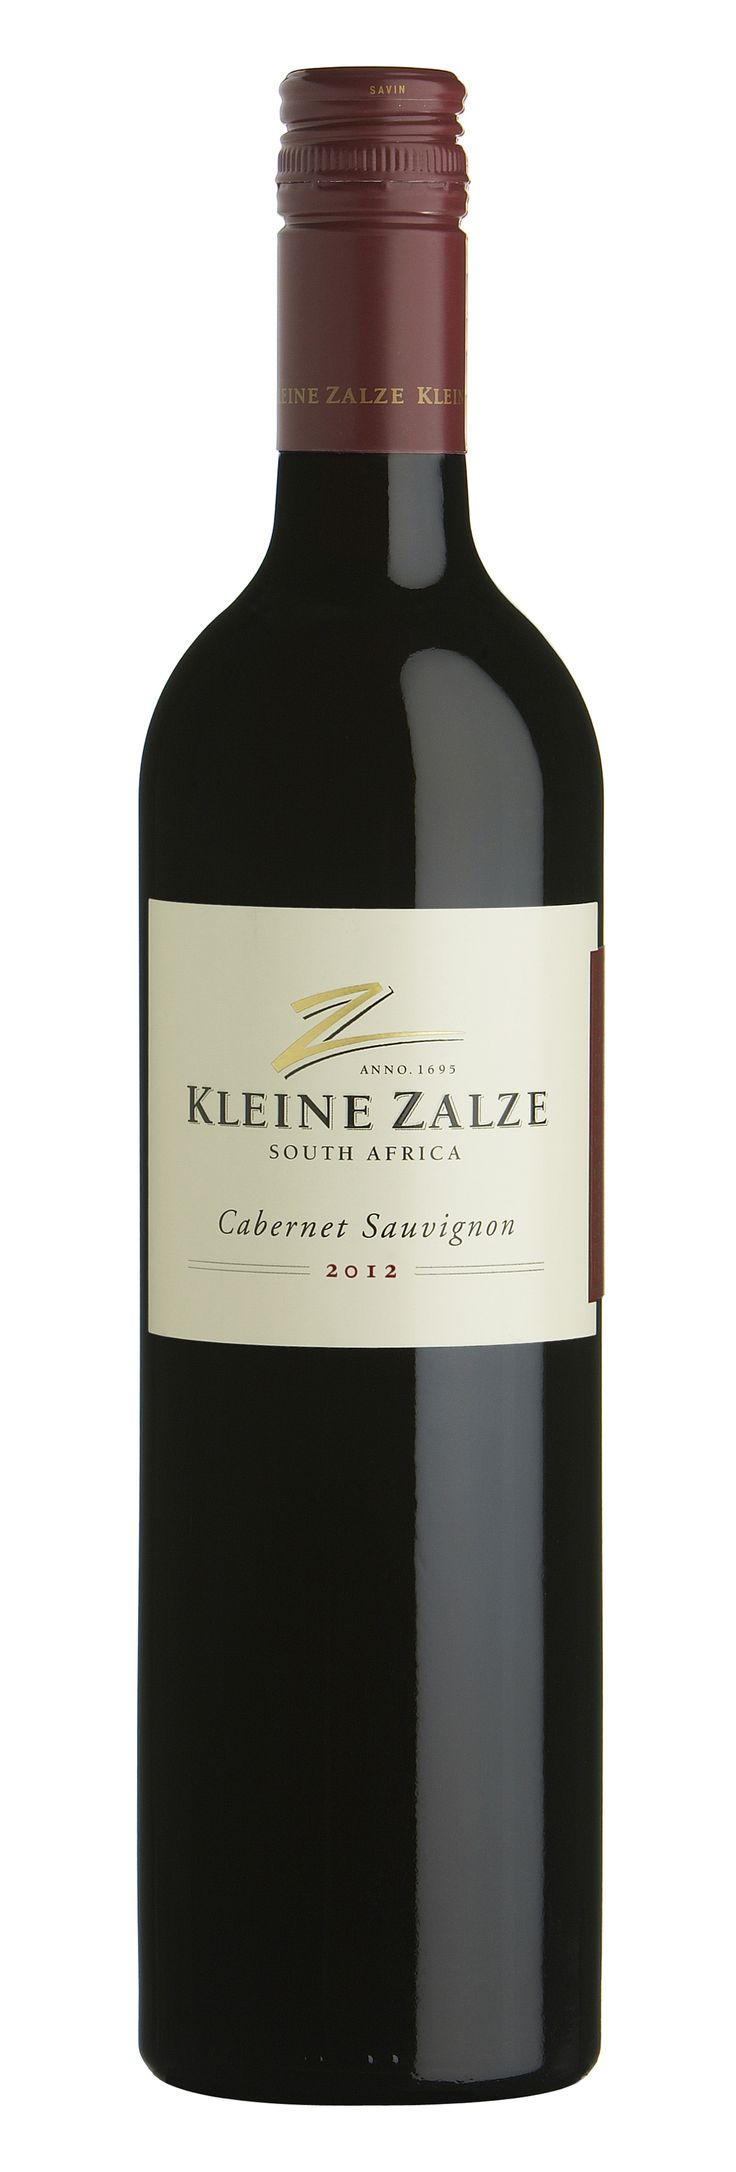 Kleine Zalze CS Cabernet Sauvignon 2012